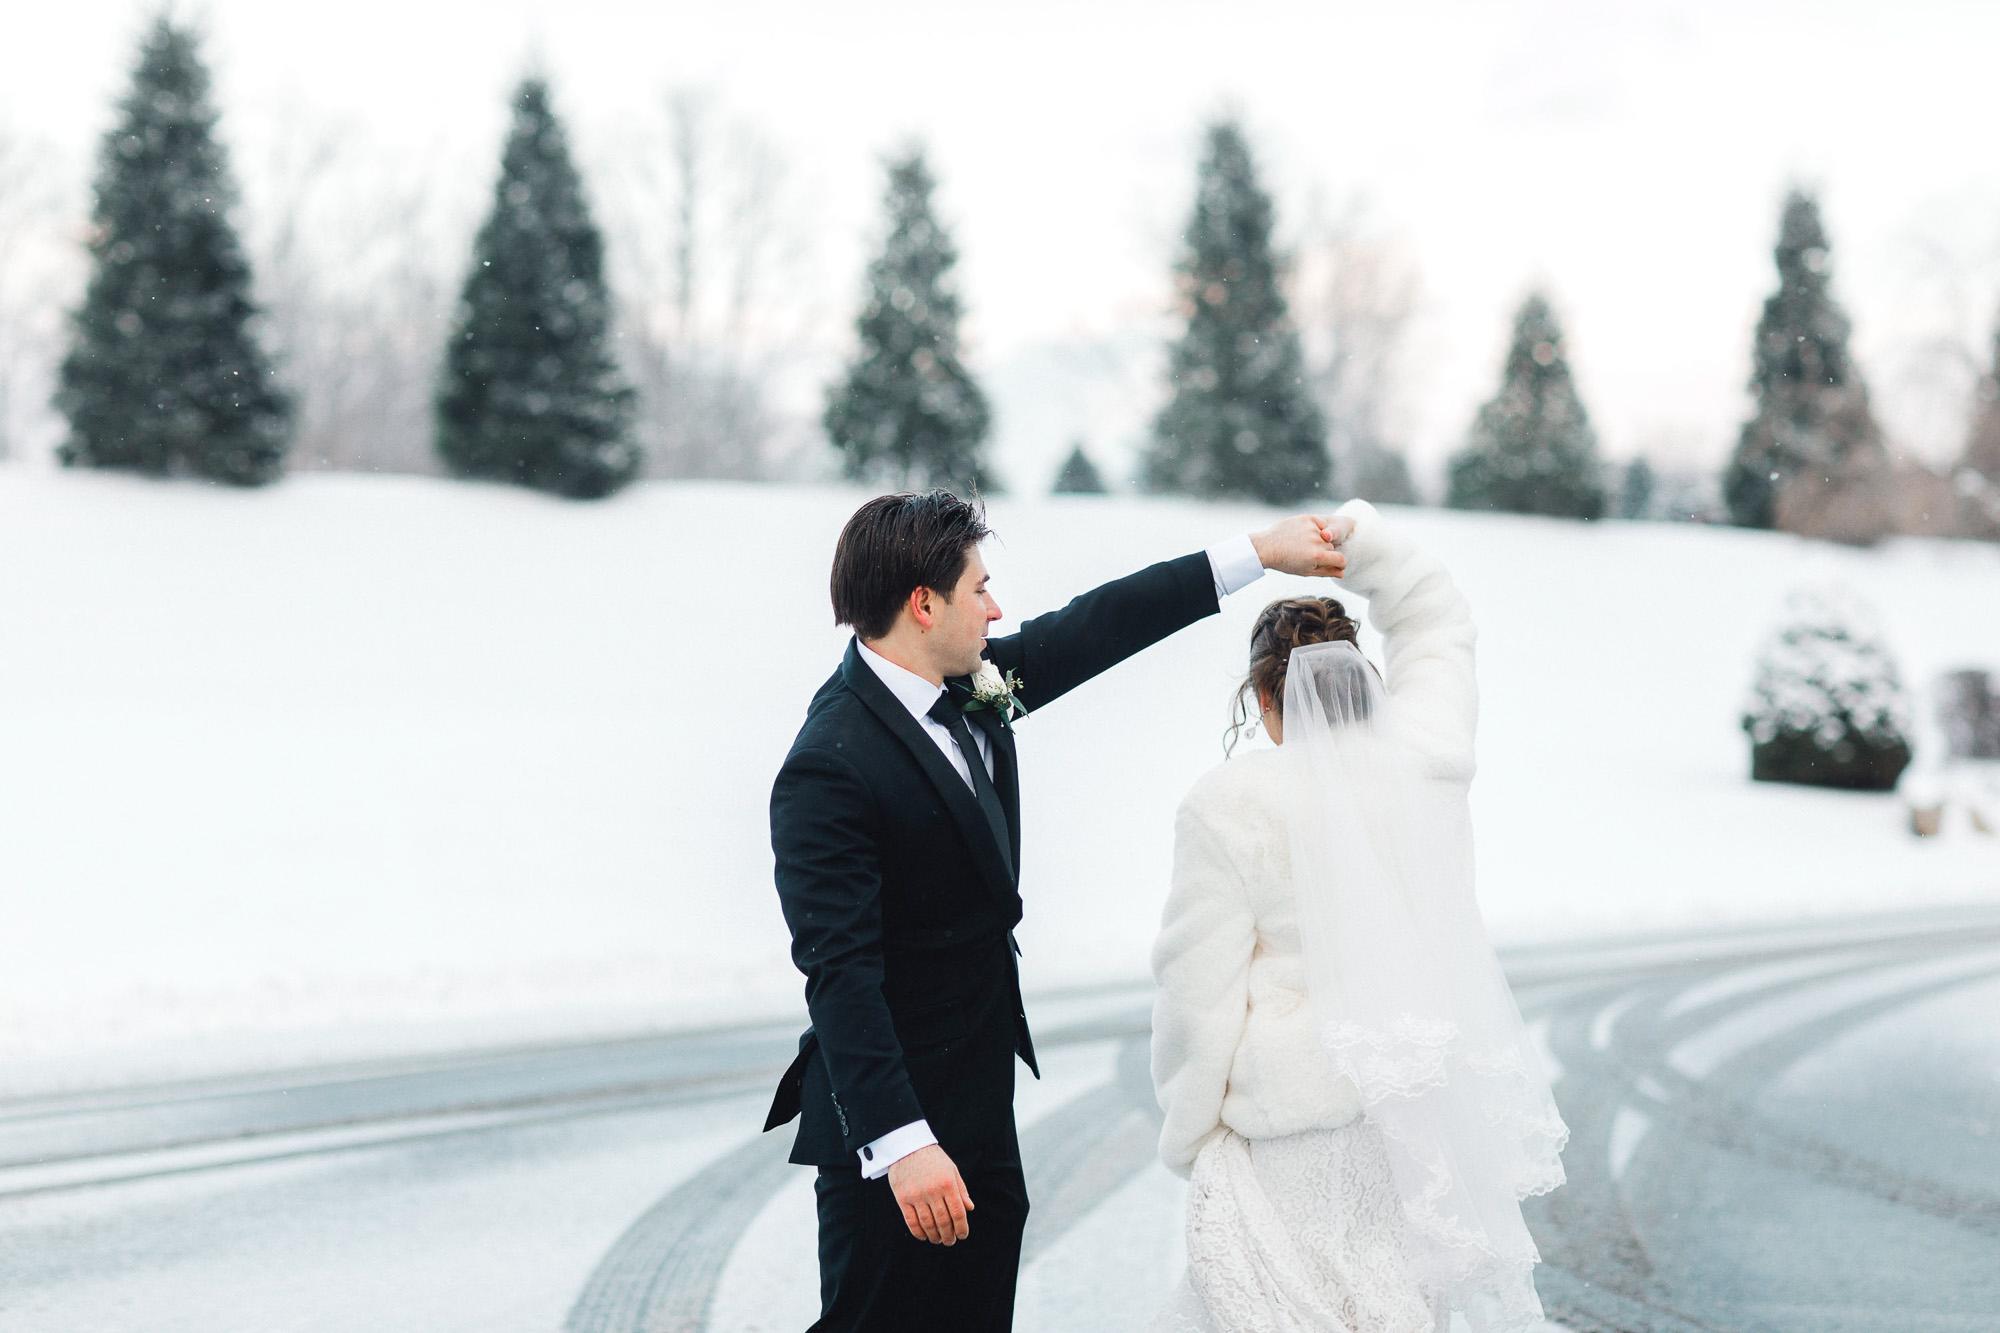 snowy-sand-springs-country-club-drums-pa-christmas-wedding-24788.jpg